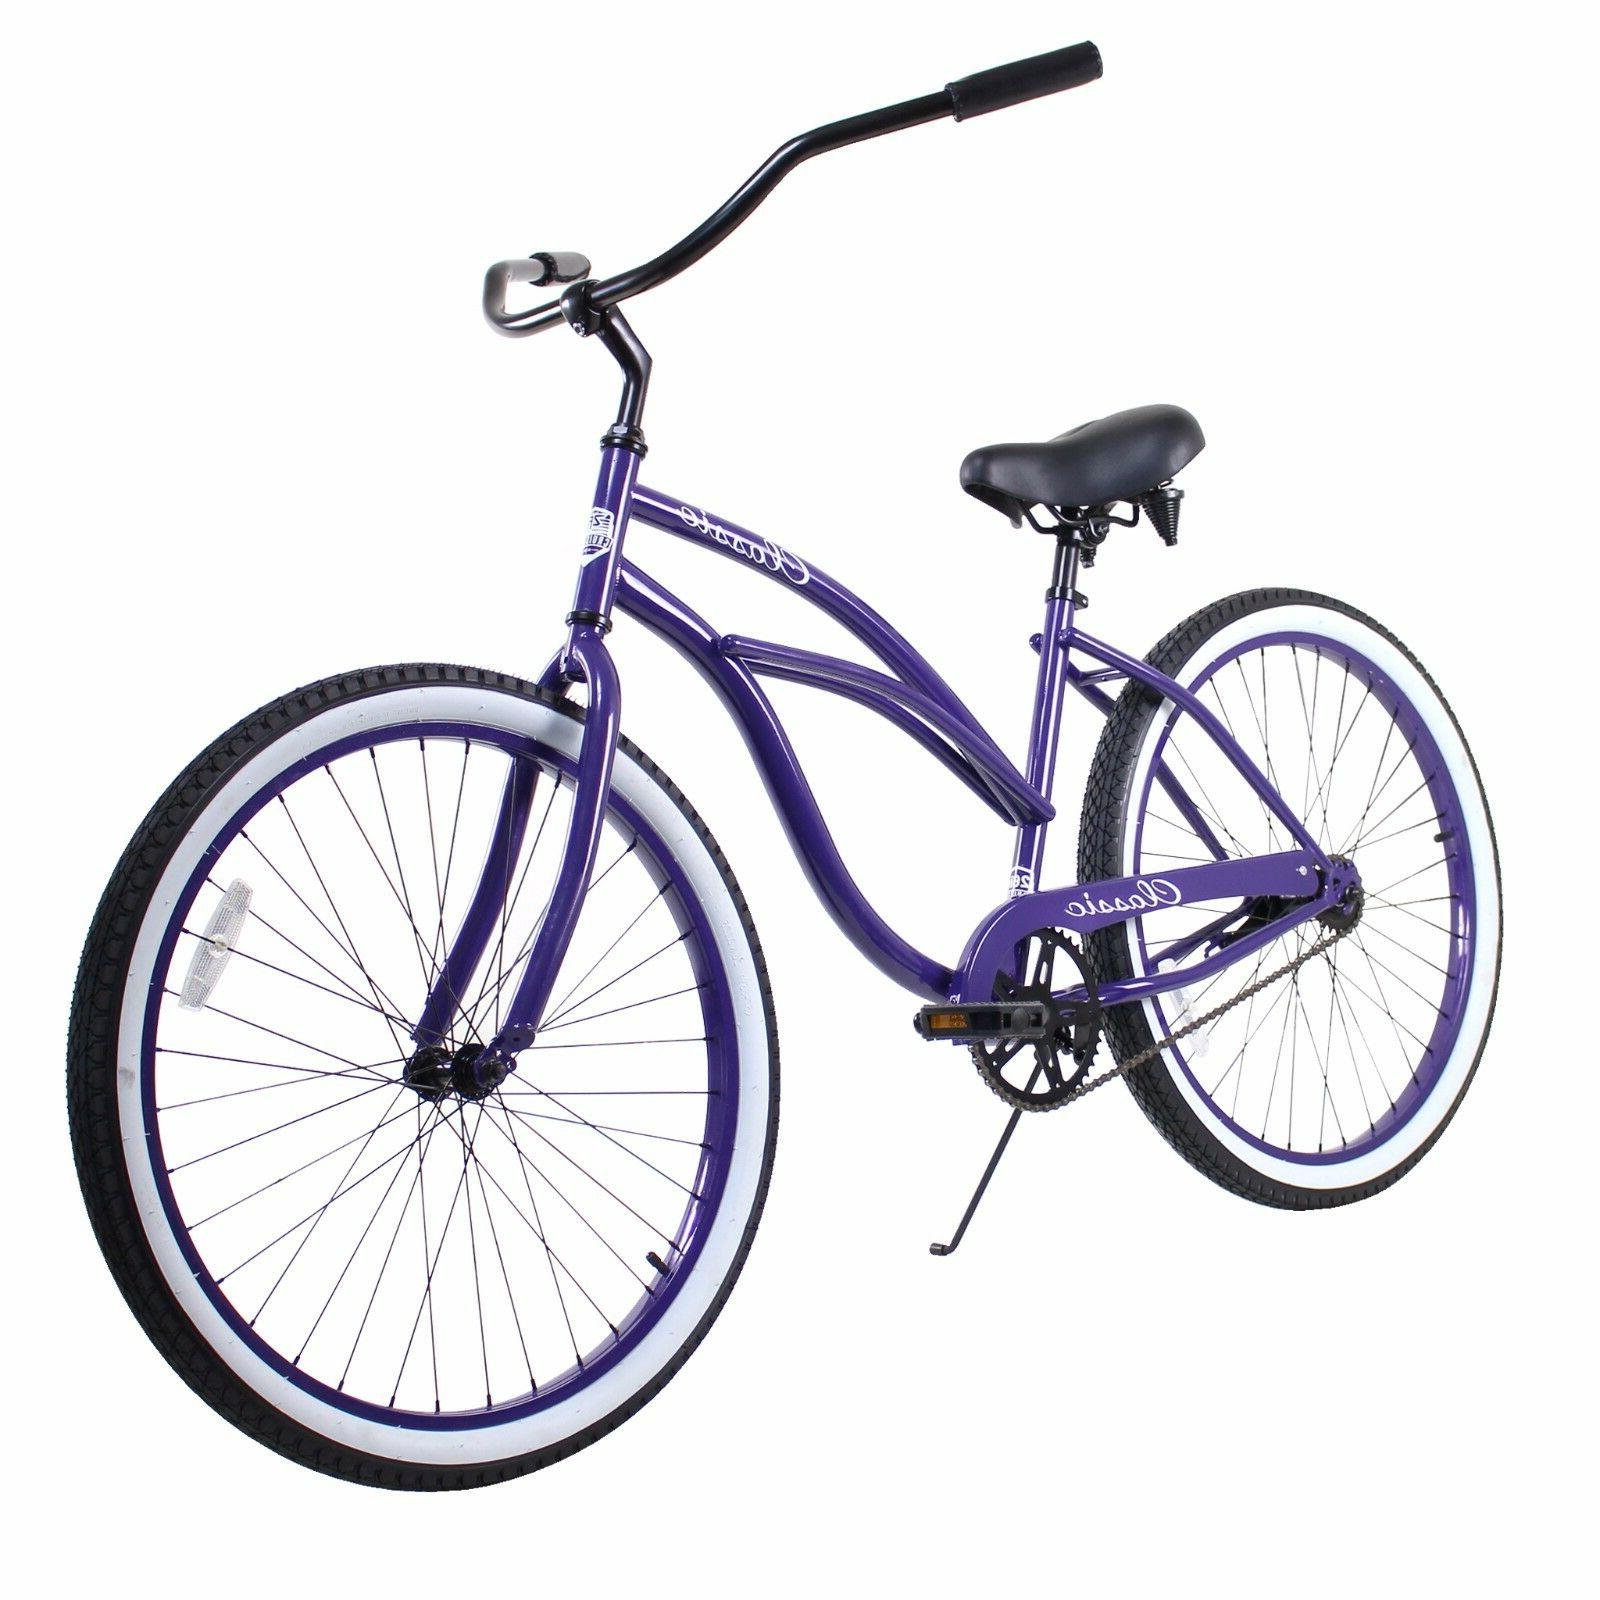 purple adult 26 zf bikes classic single